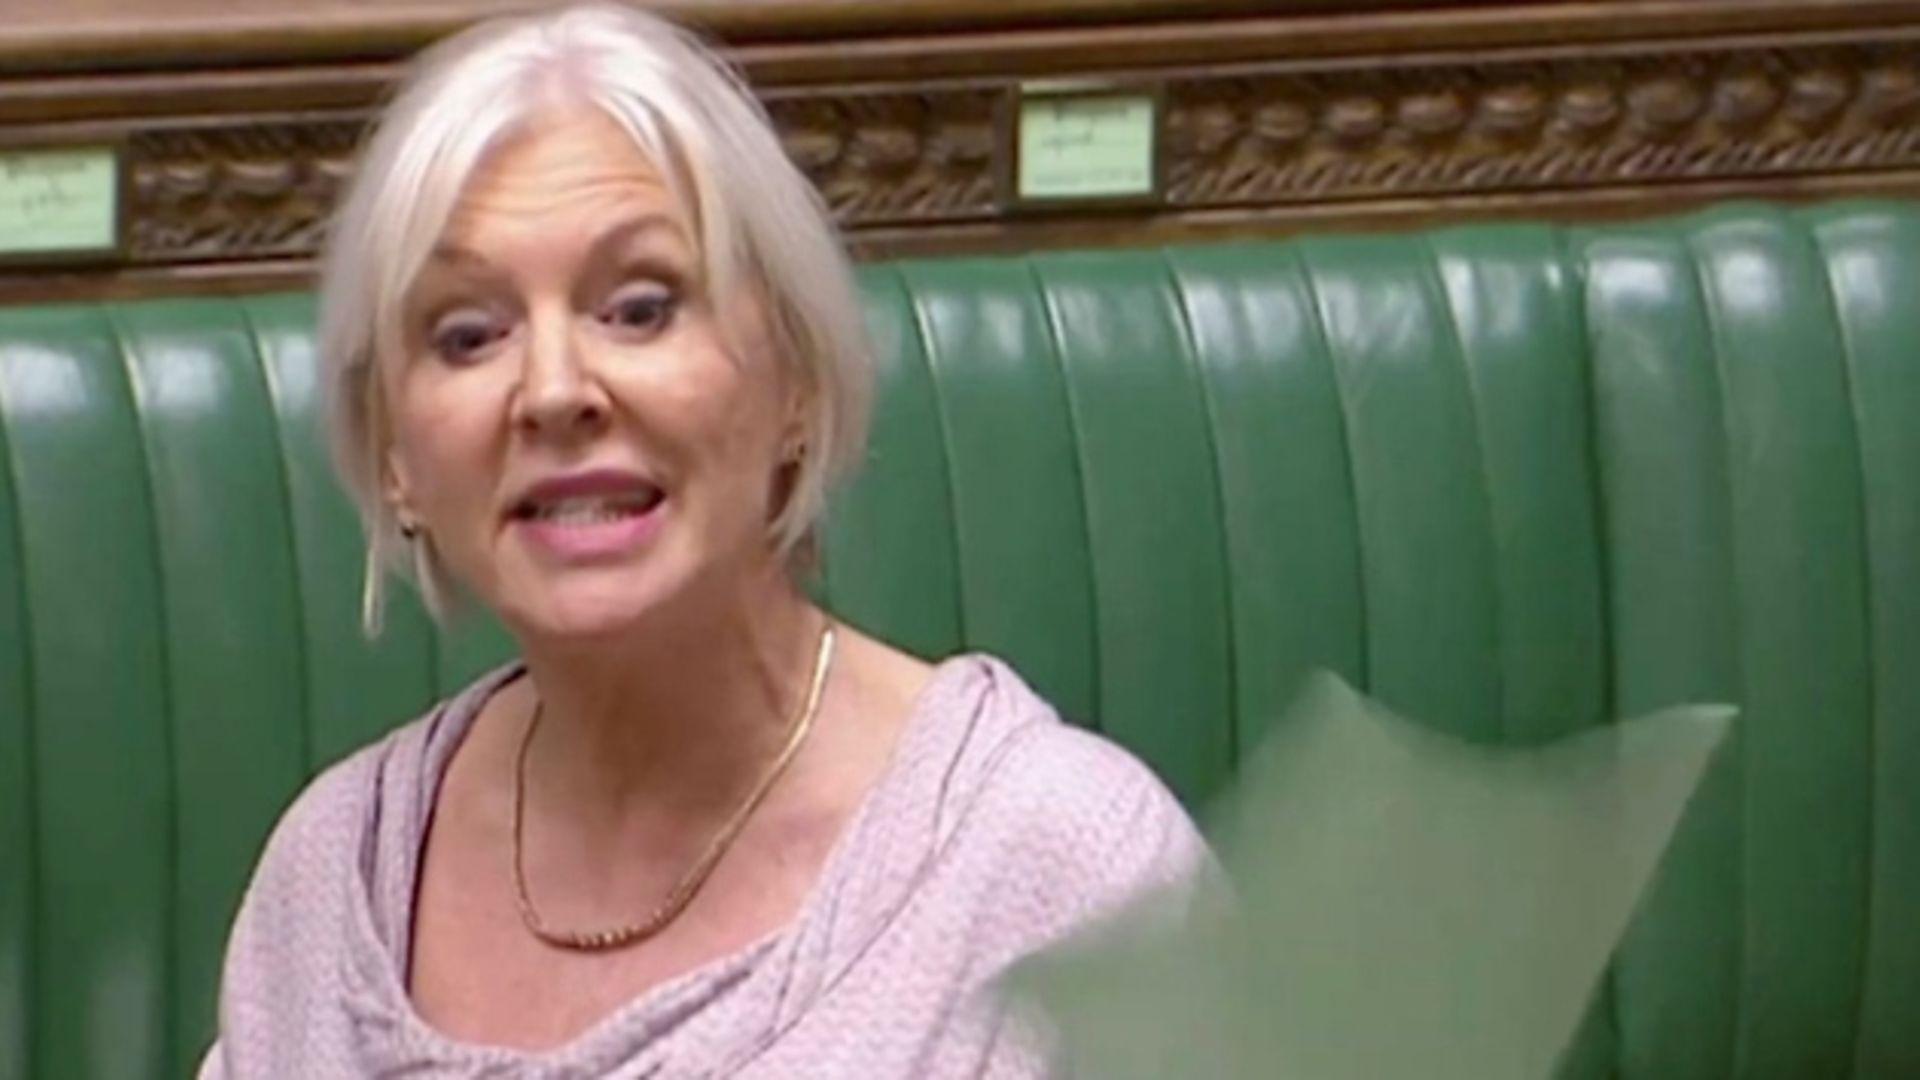 Nadine Dorries MP. Photograph: Parliament TV.